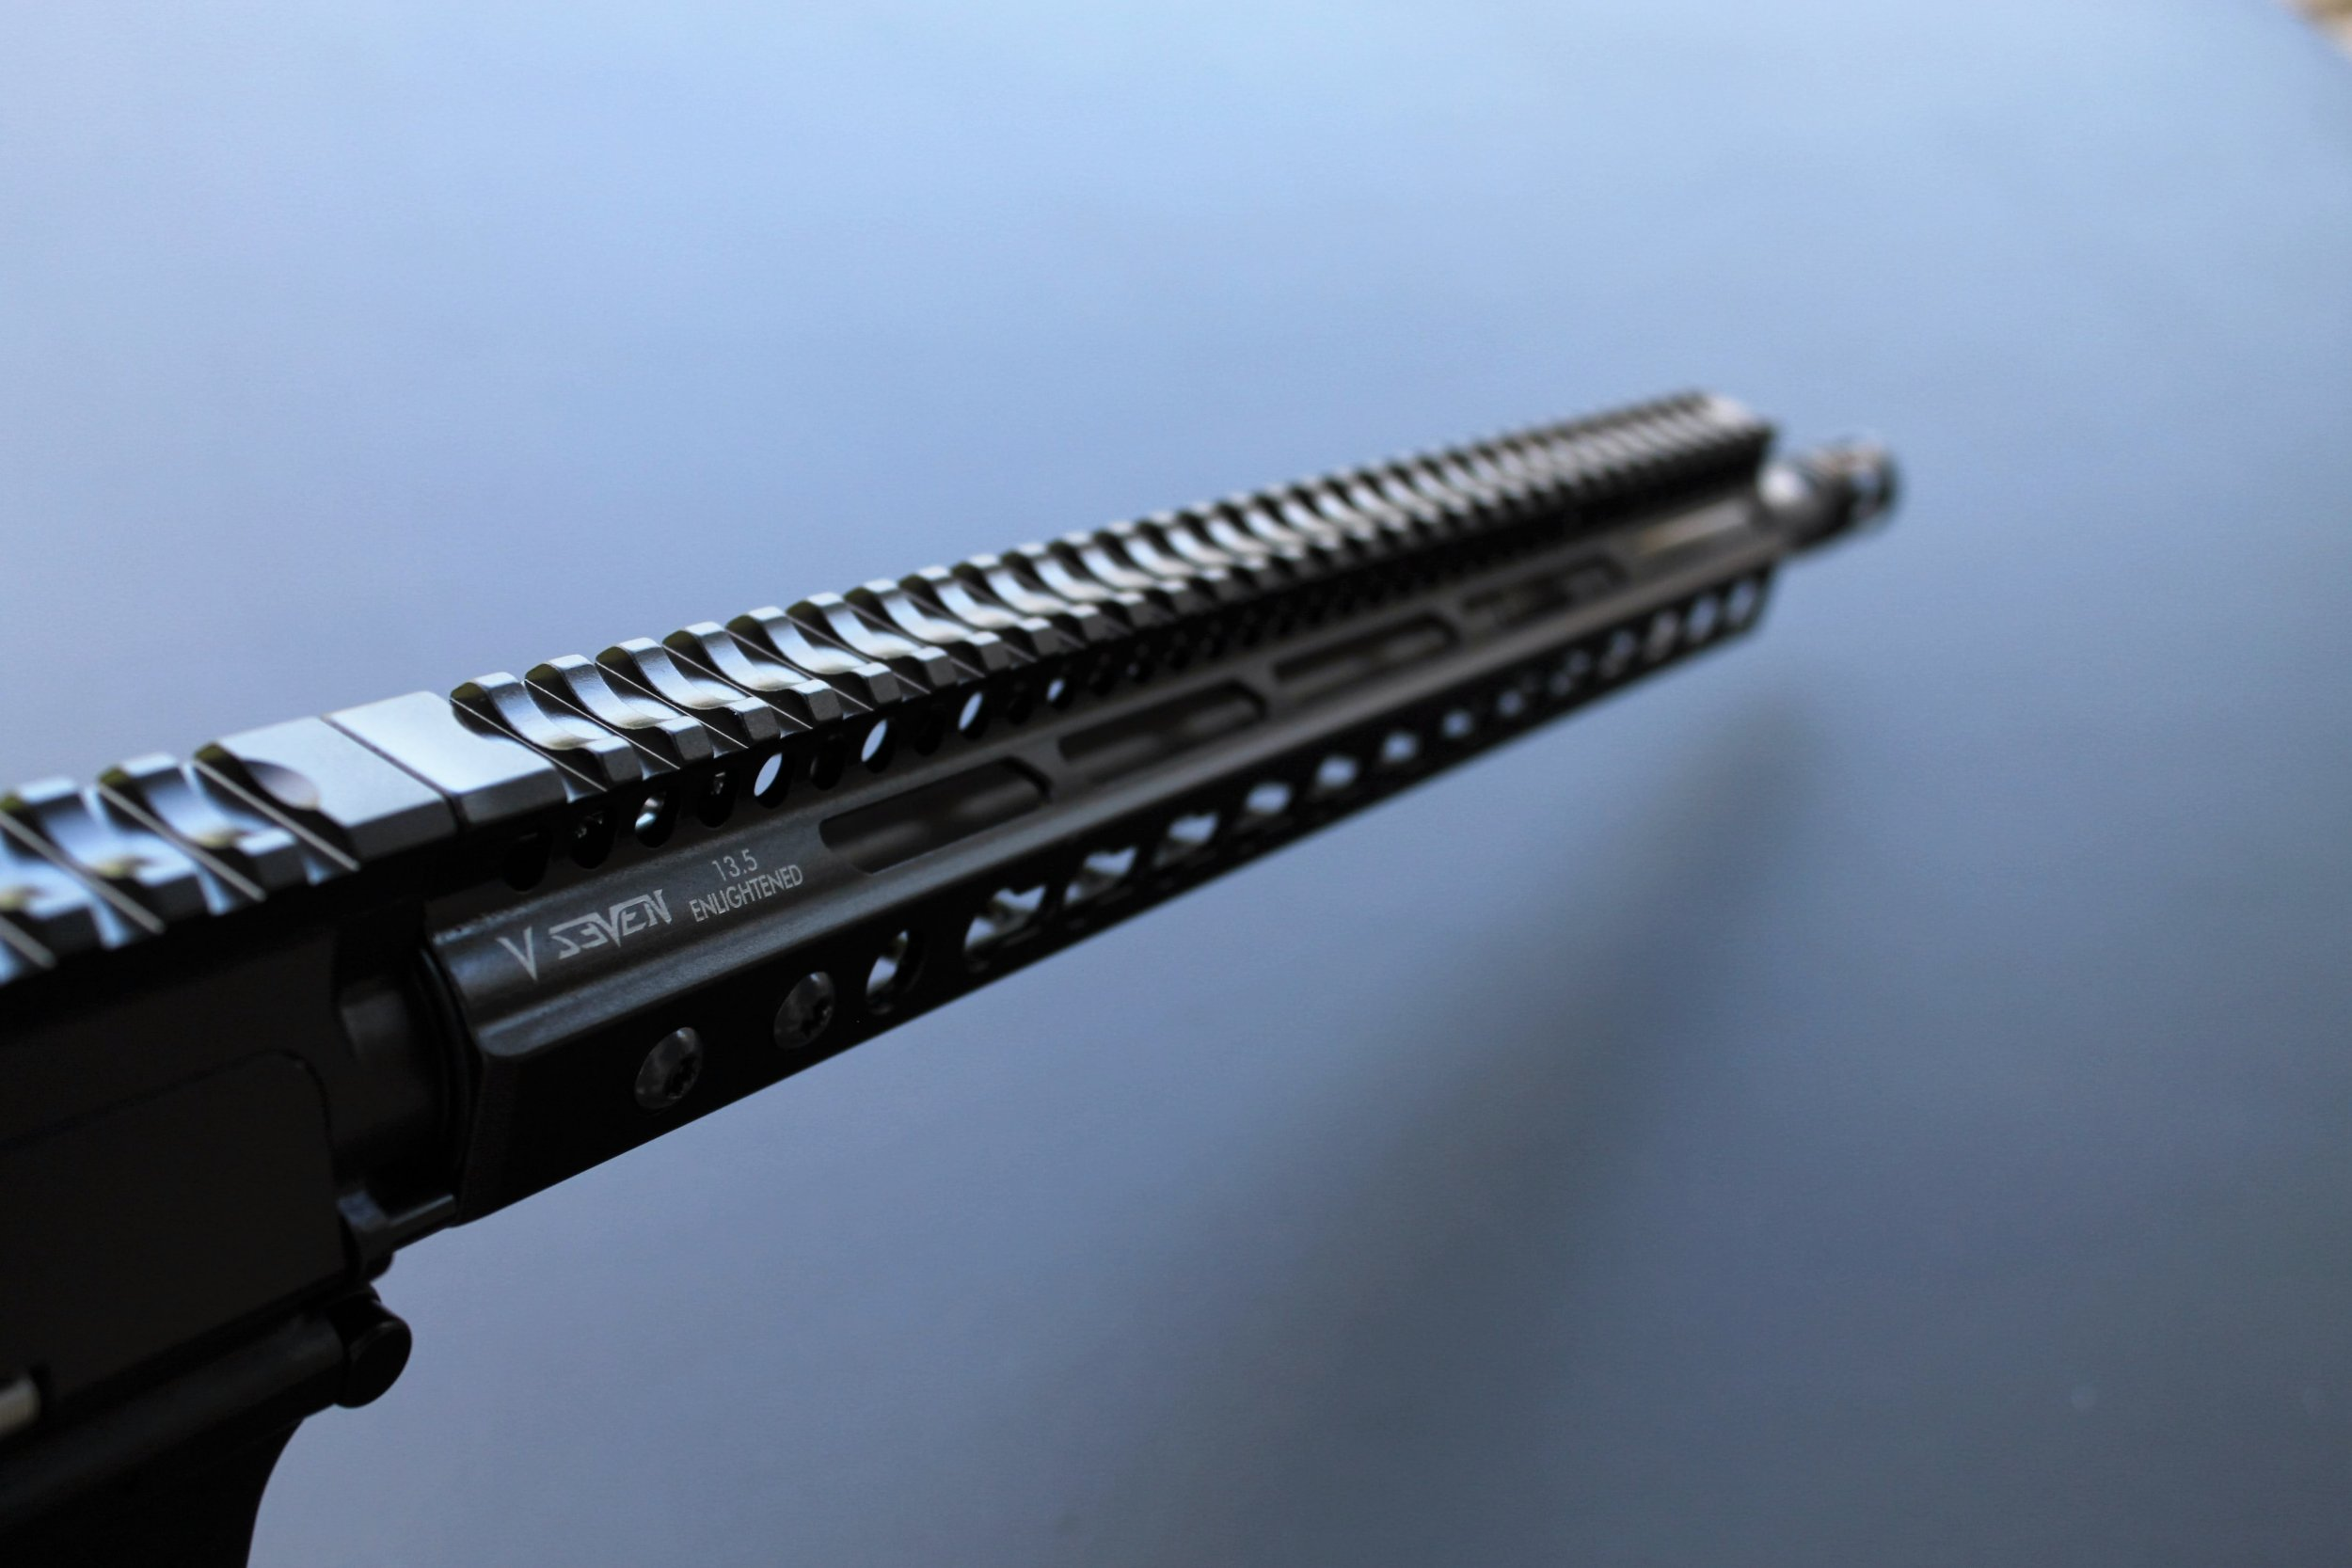 V Seven (V7) Weapon Systems Enlightened Tactical Handguard